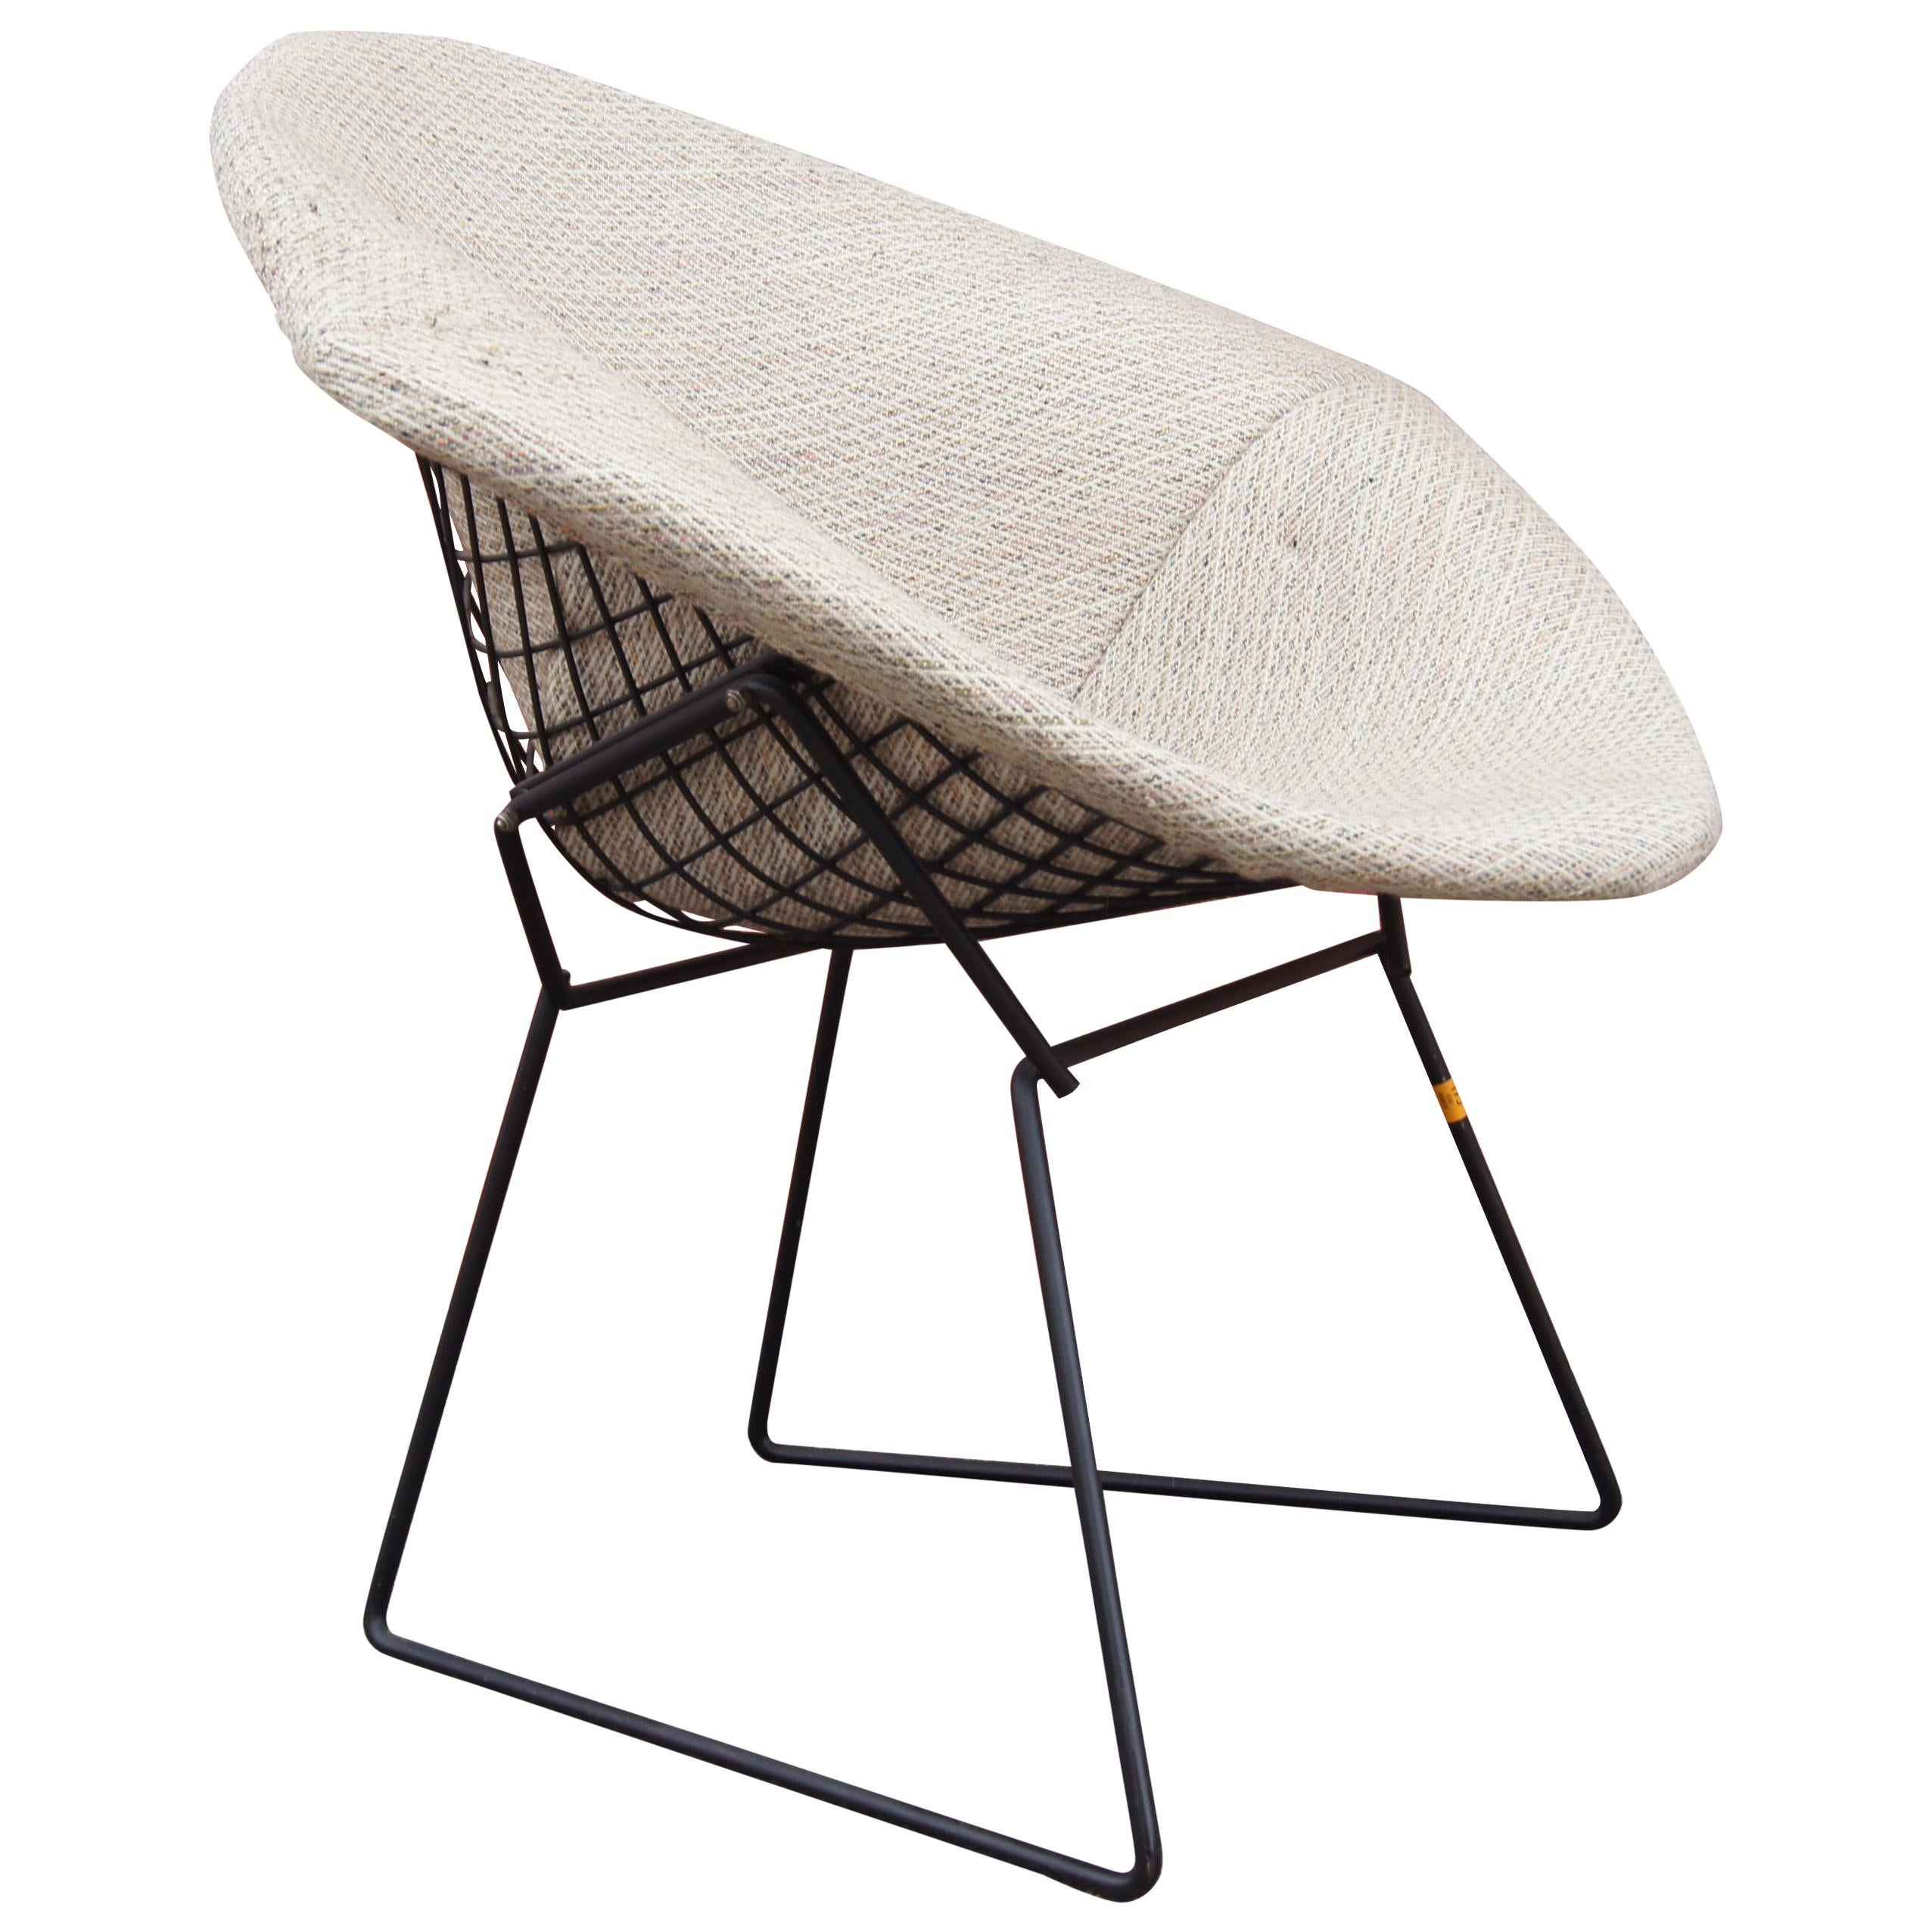 Black Diamond Chair by Harry Bertoia for Knoll